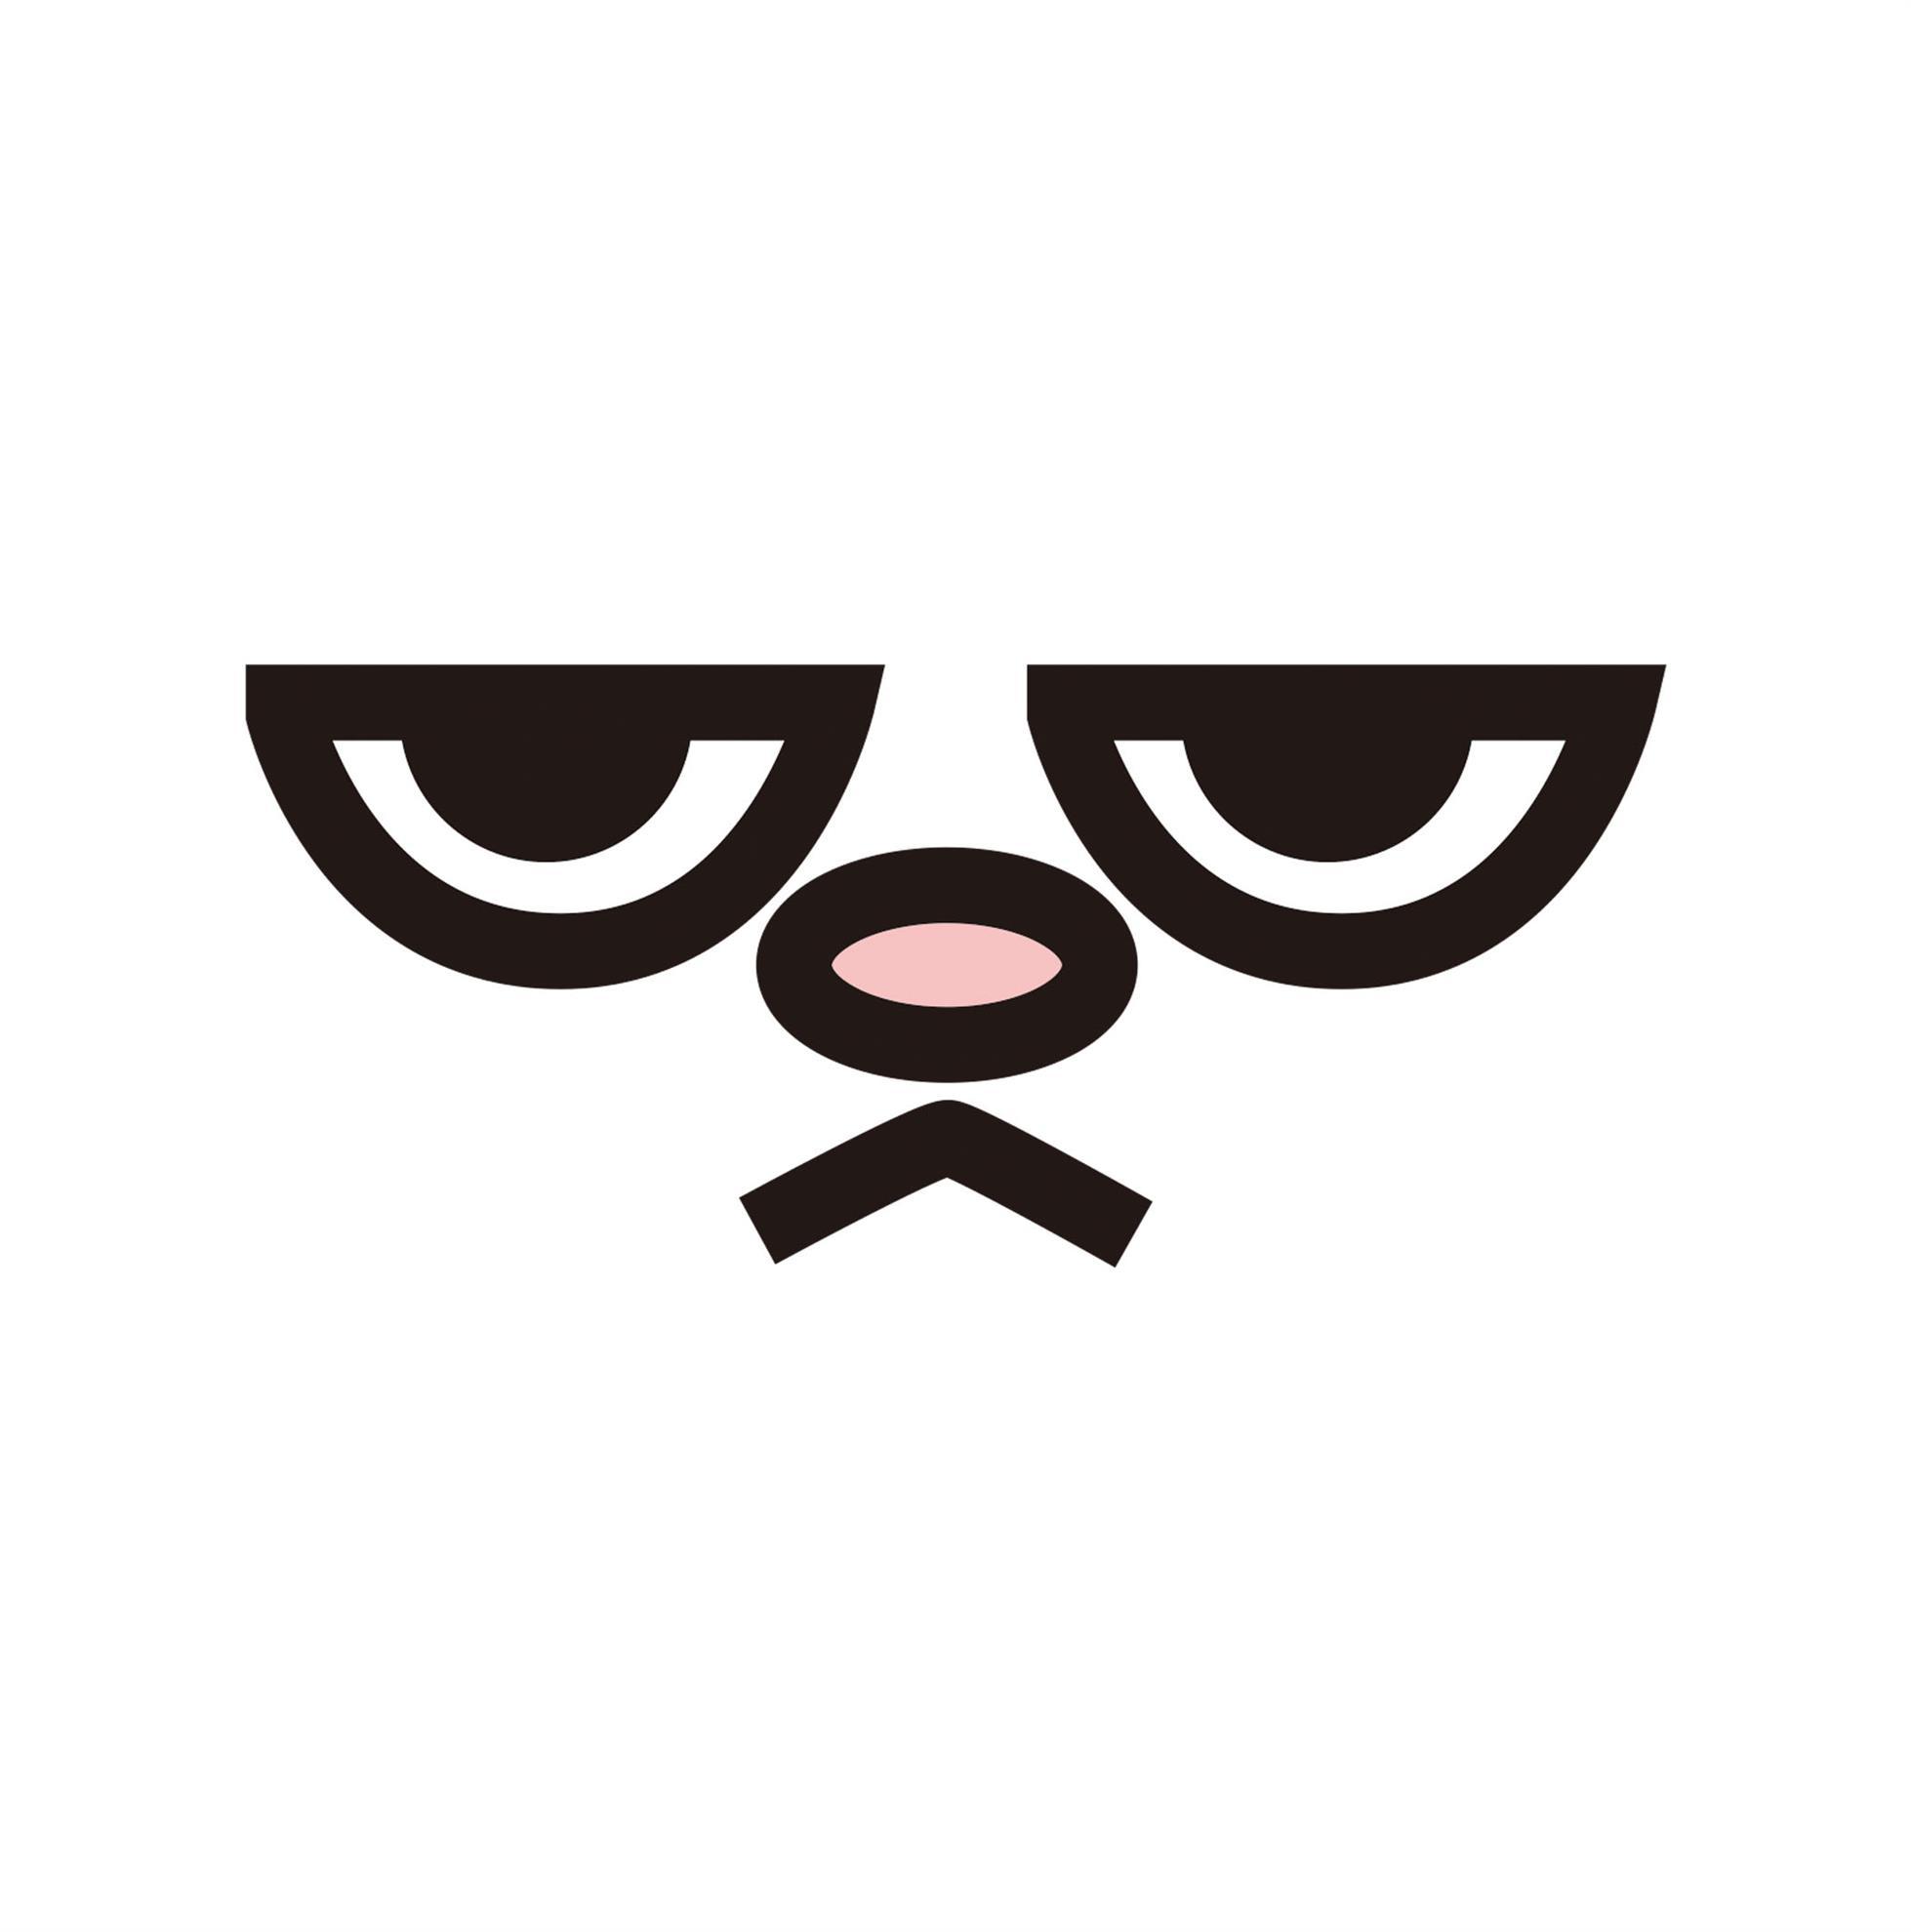 KIN MA TON 【獨家】【金農場製物架 】X《金馬桶搞笑漫畫》